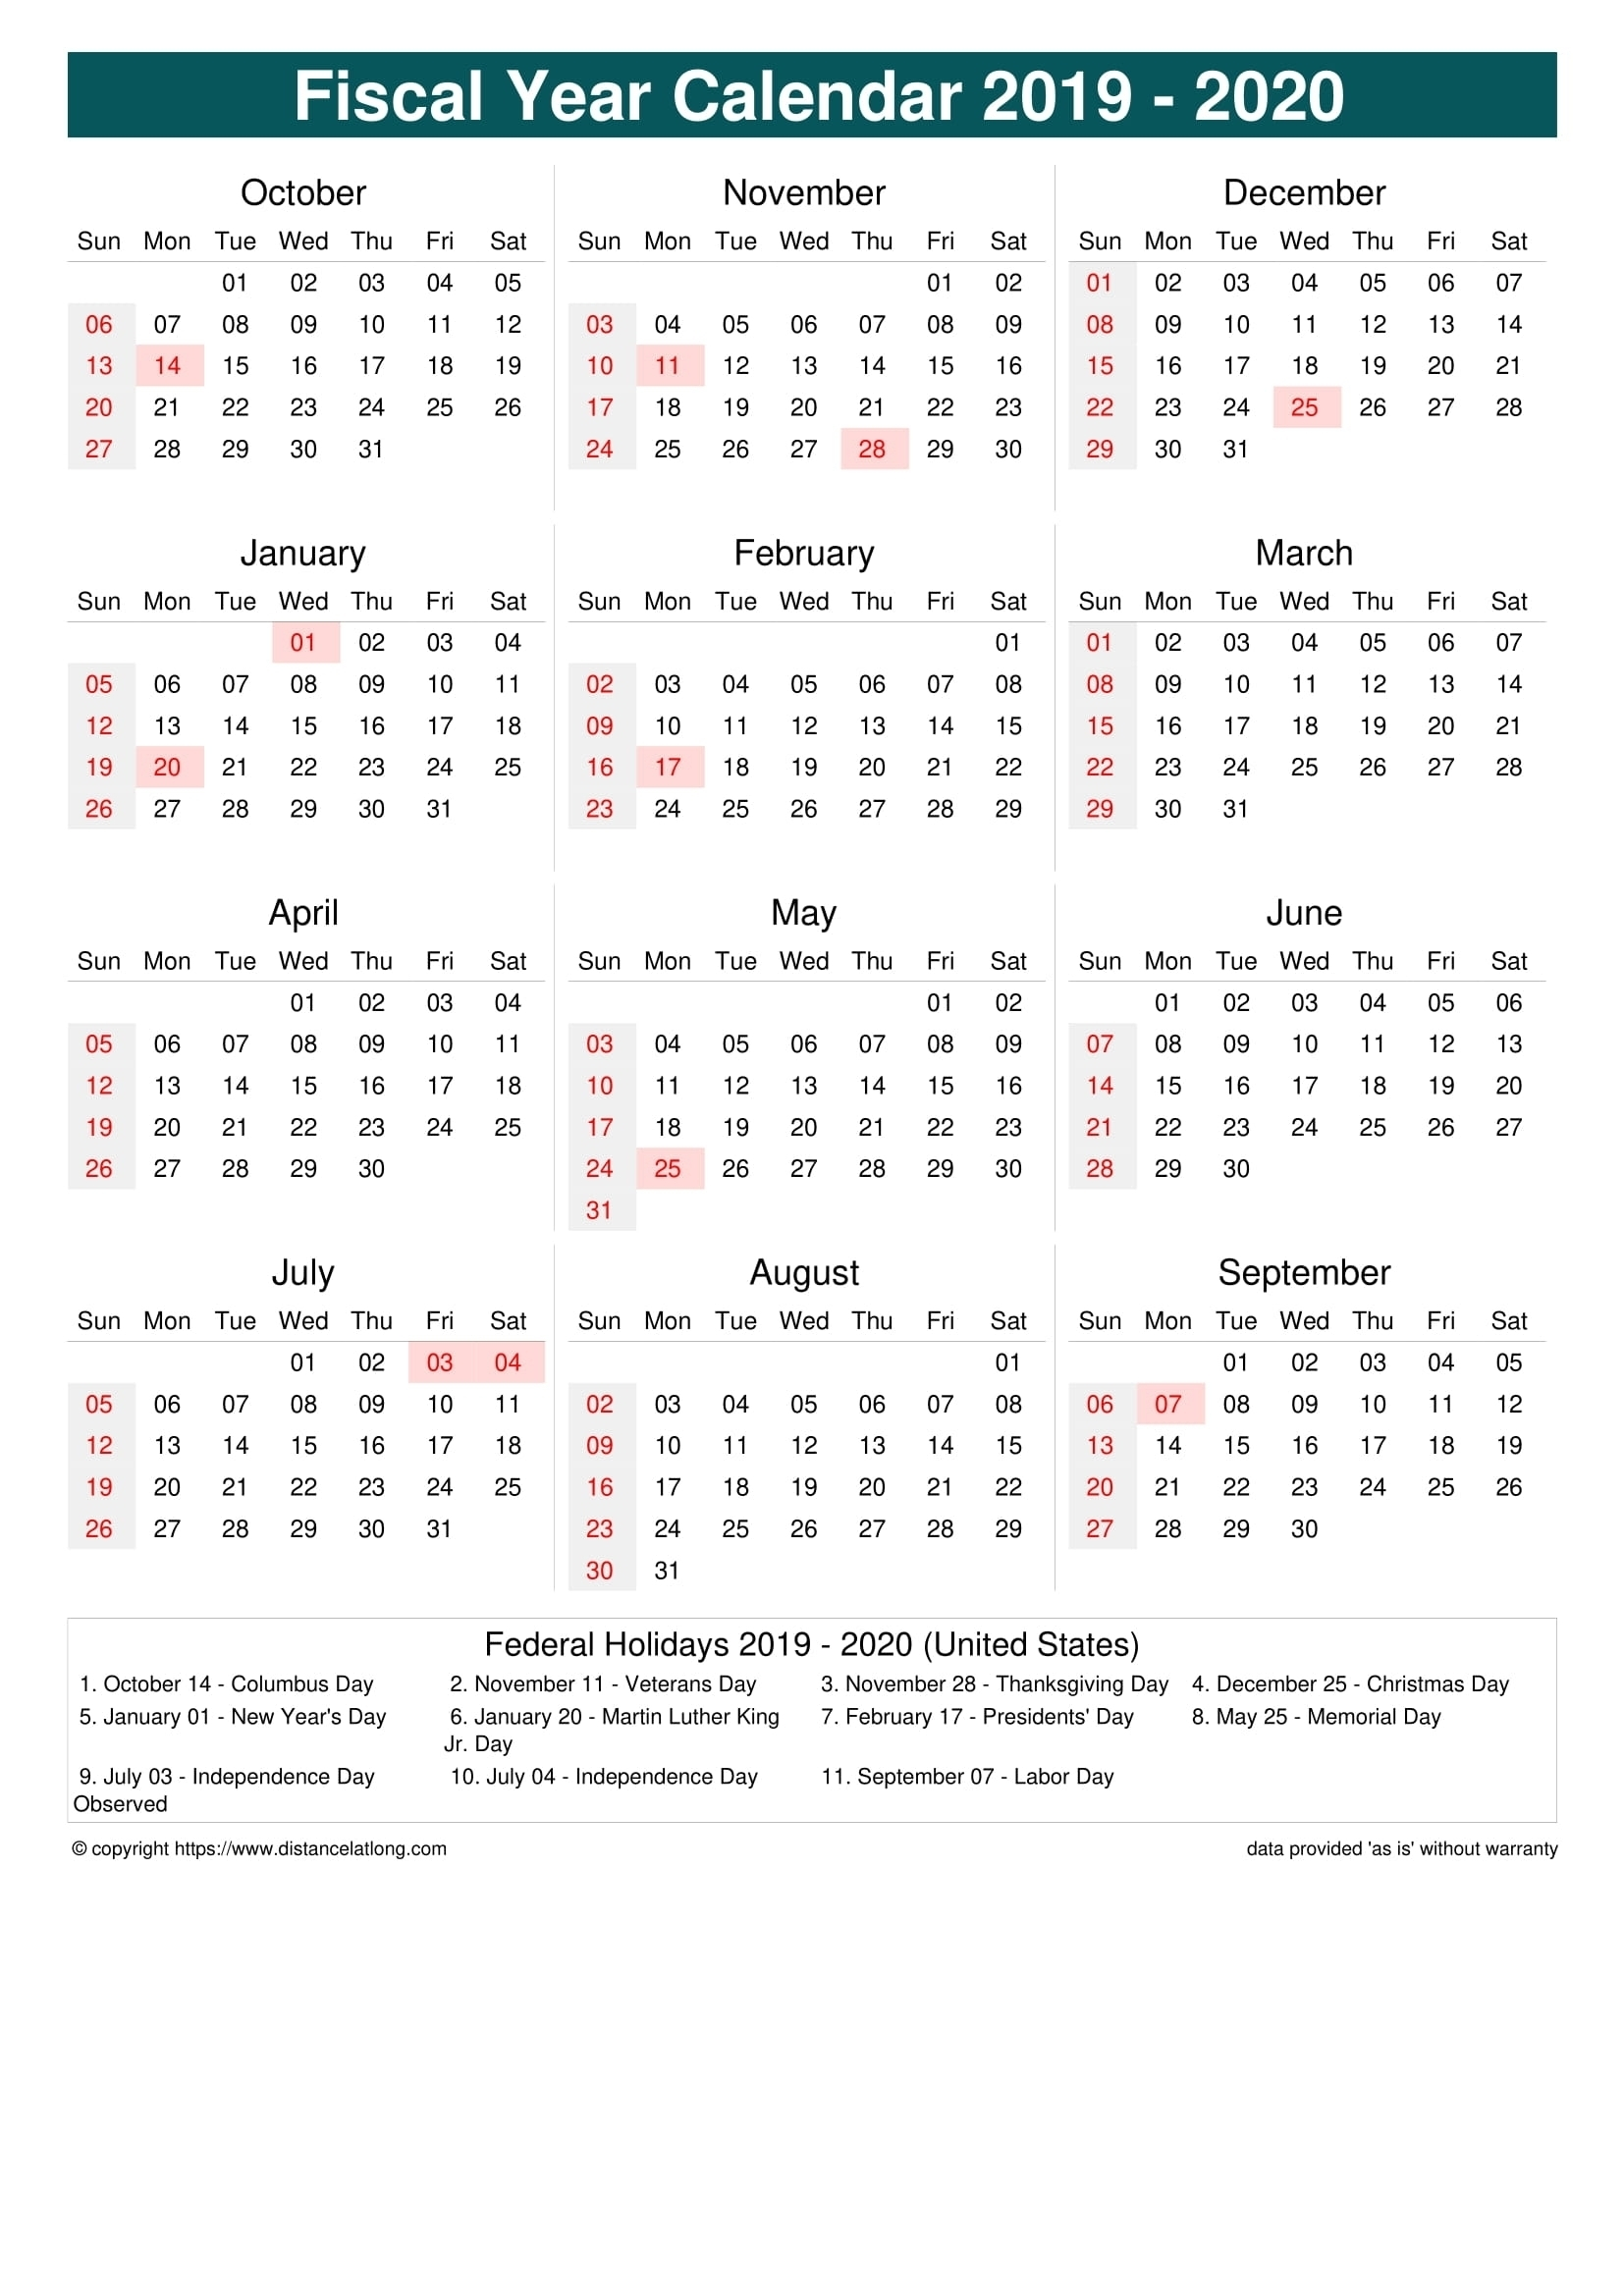 Financial Calendar 2019-2020 In Weeks - Calendar